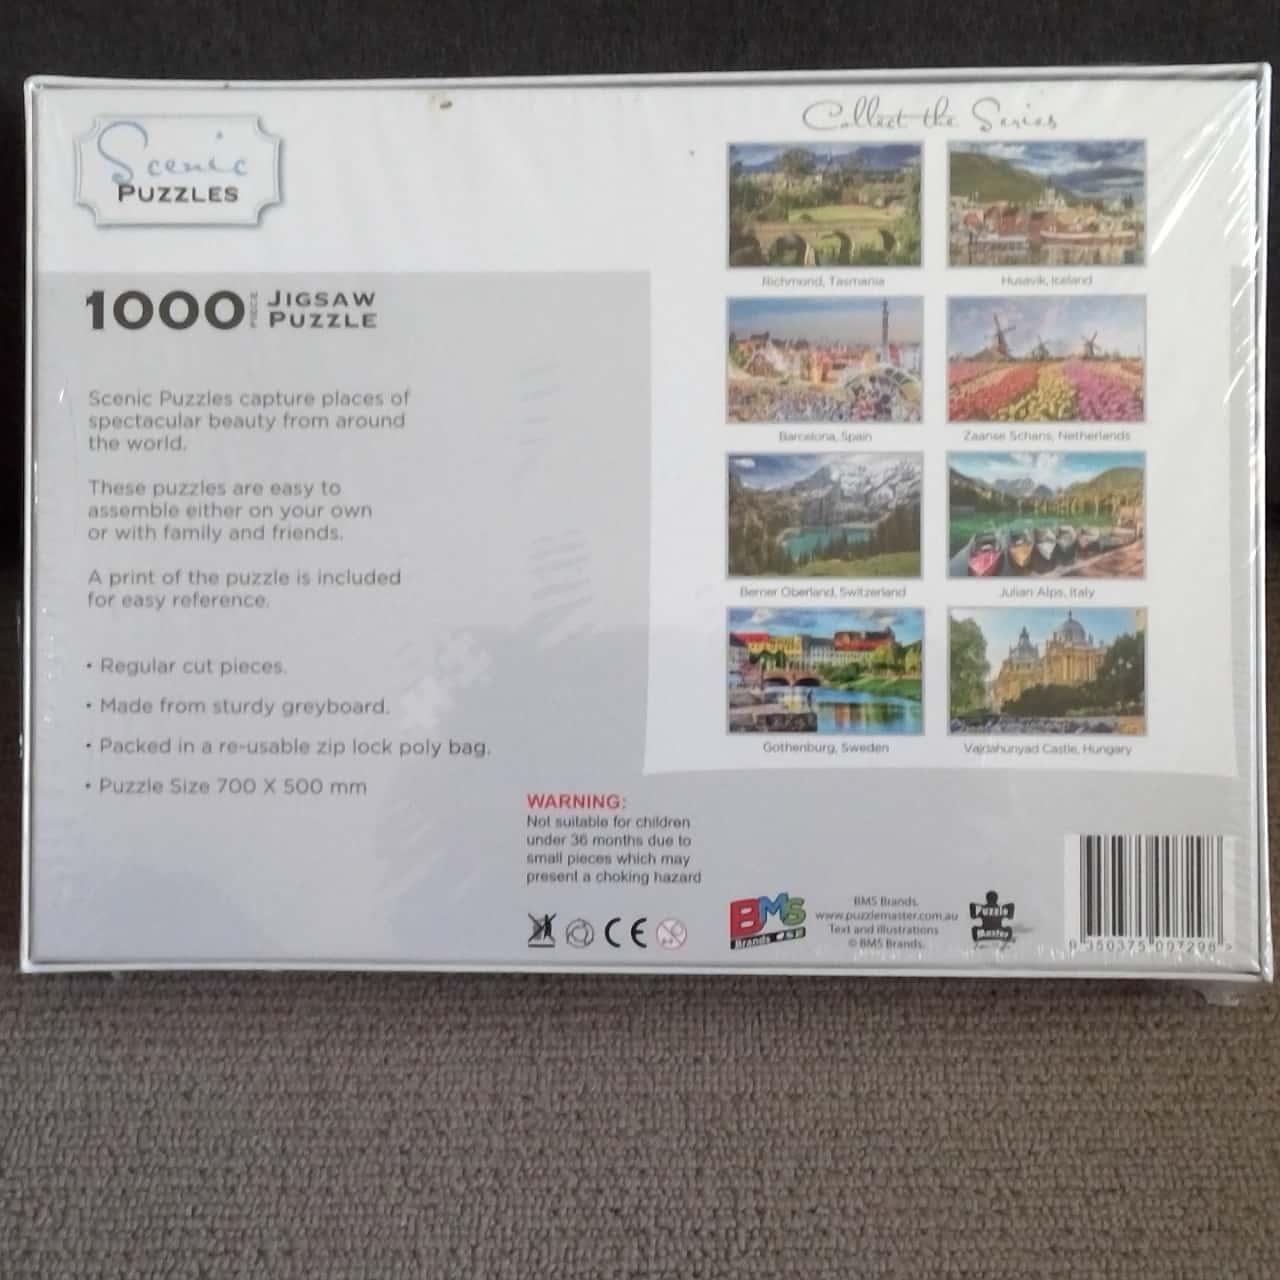 BNWT 1000 PIECE JIGSAW PUZZLE NETHERLANDS SEALED BOX